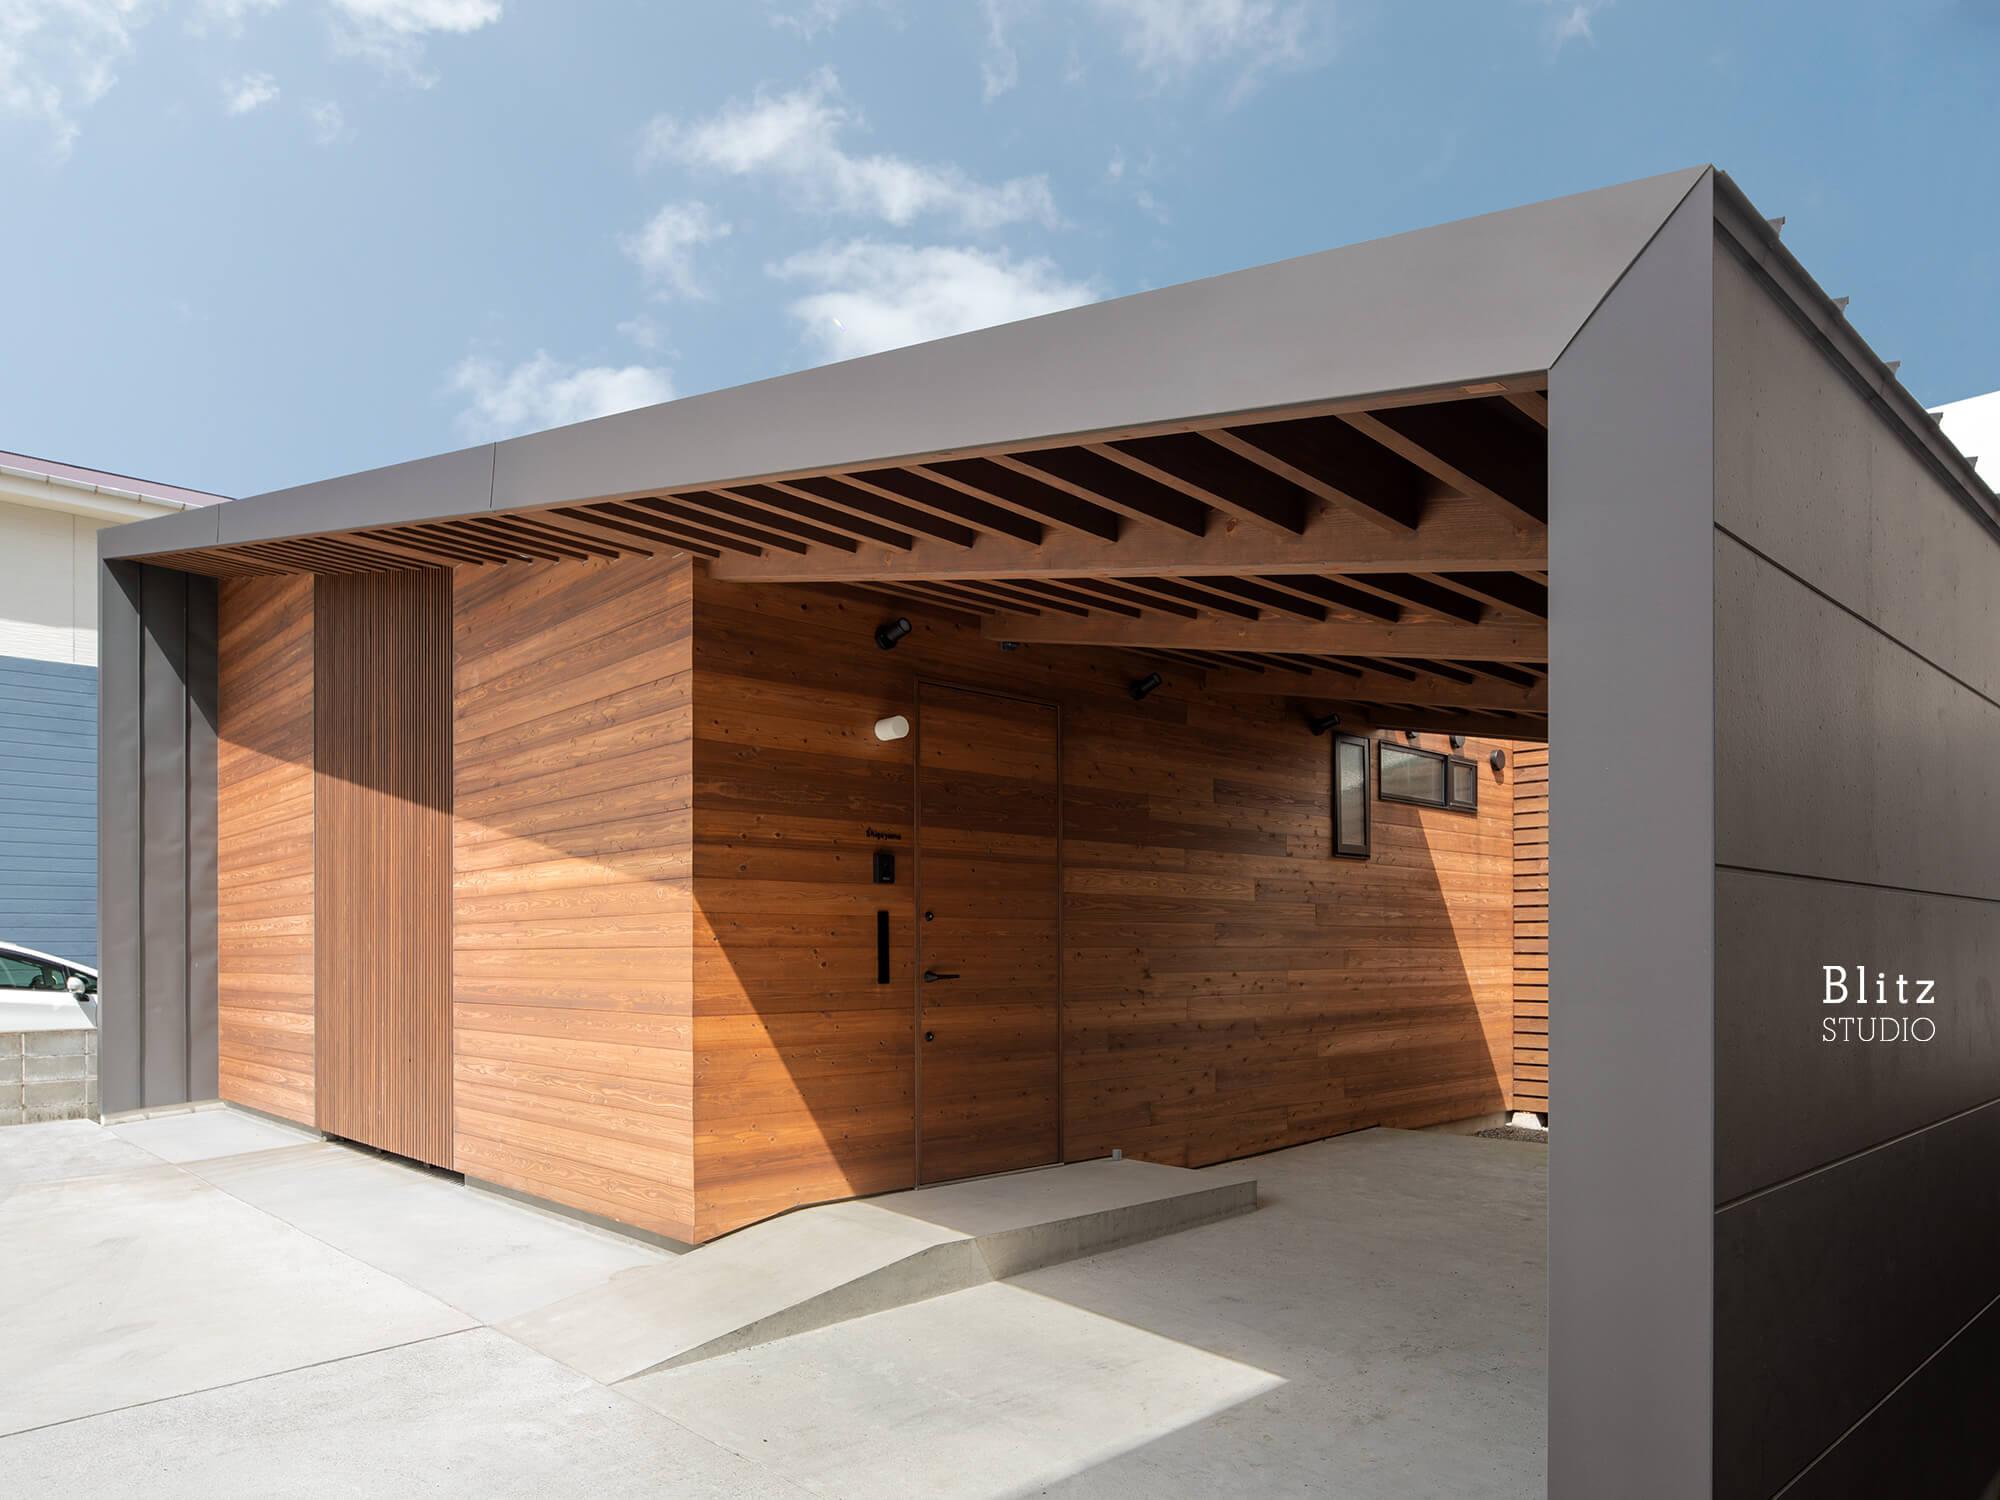 『鳩浜の家』-鹿児島県奄美市-建築写真・竣工写真・インテリア写真2